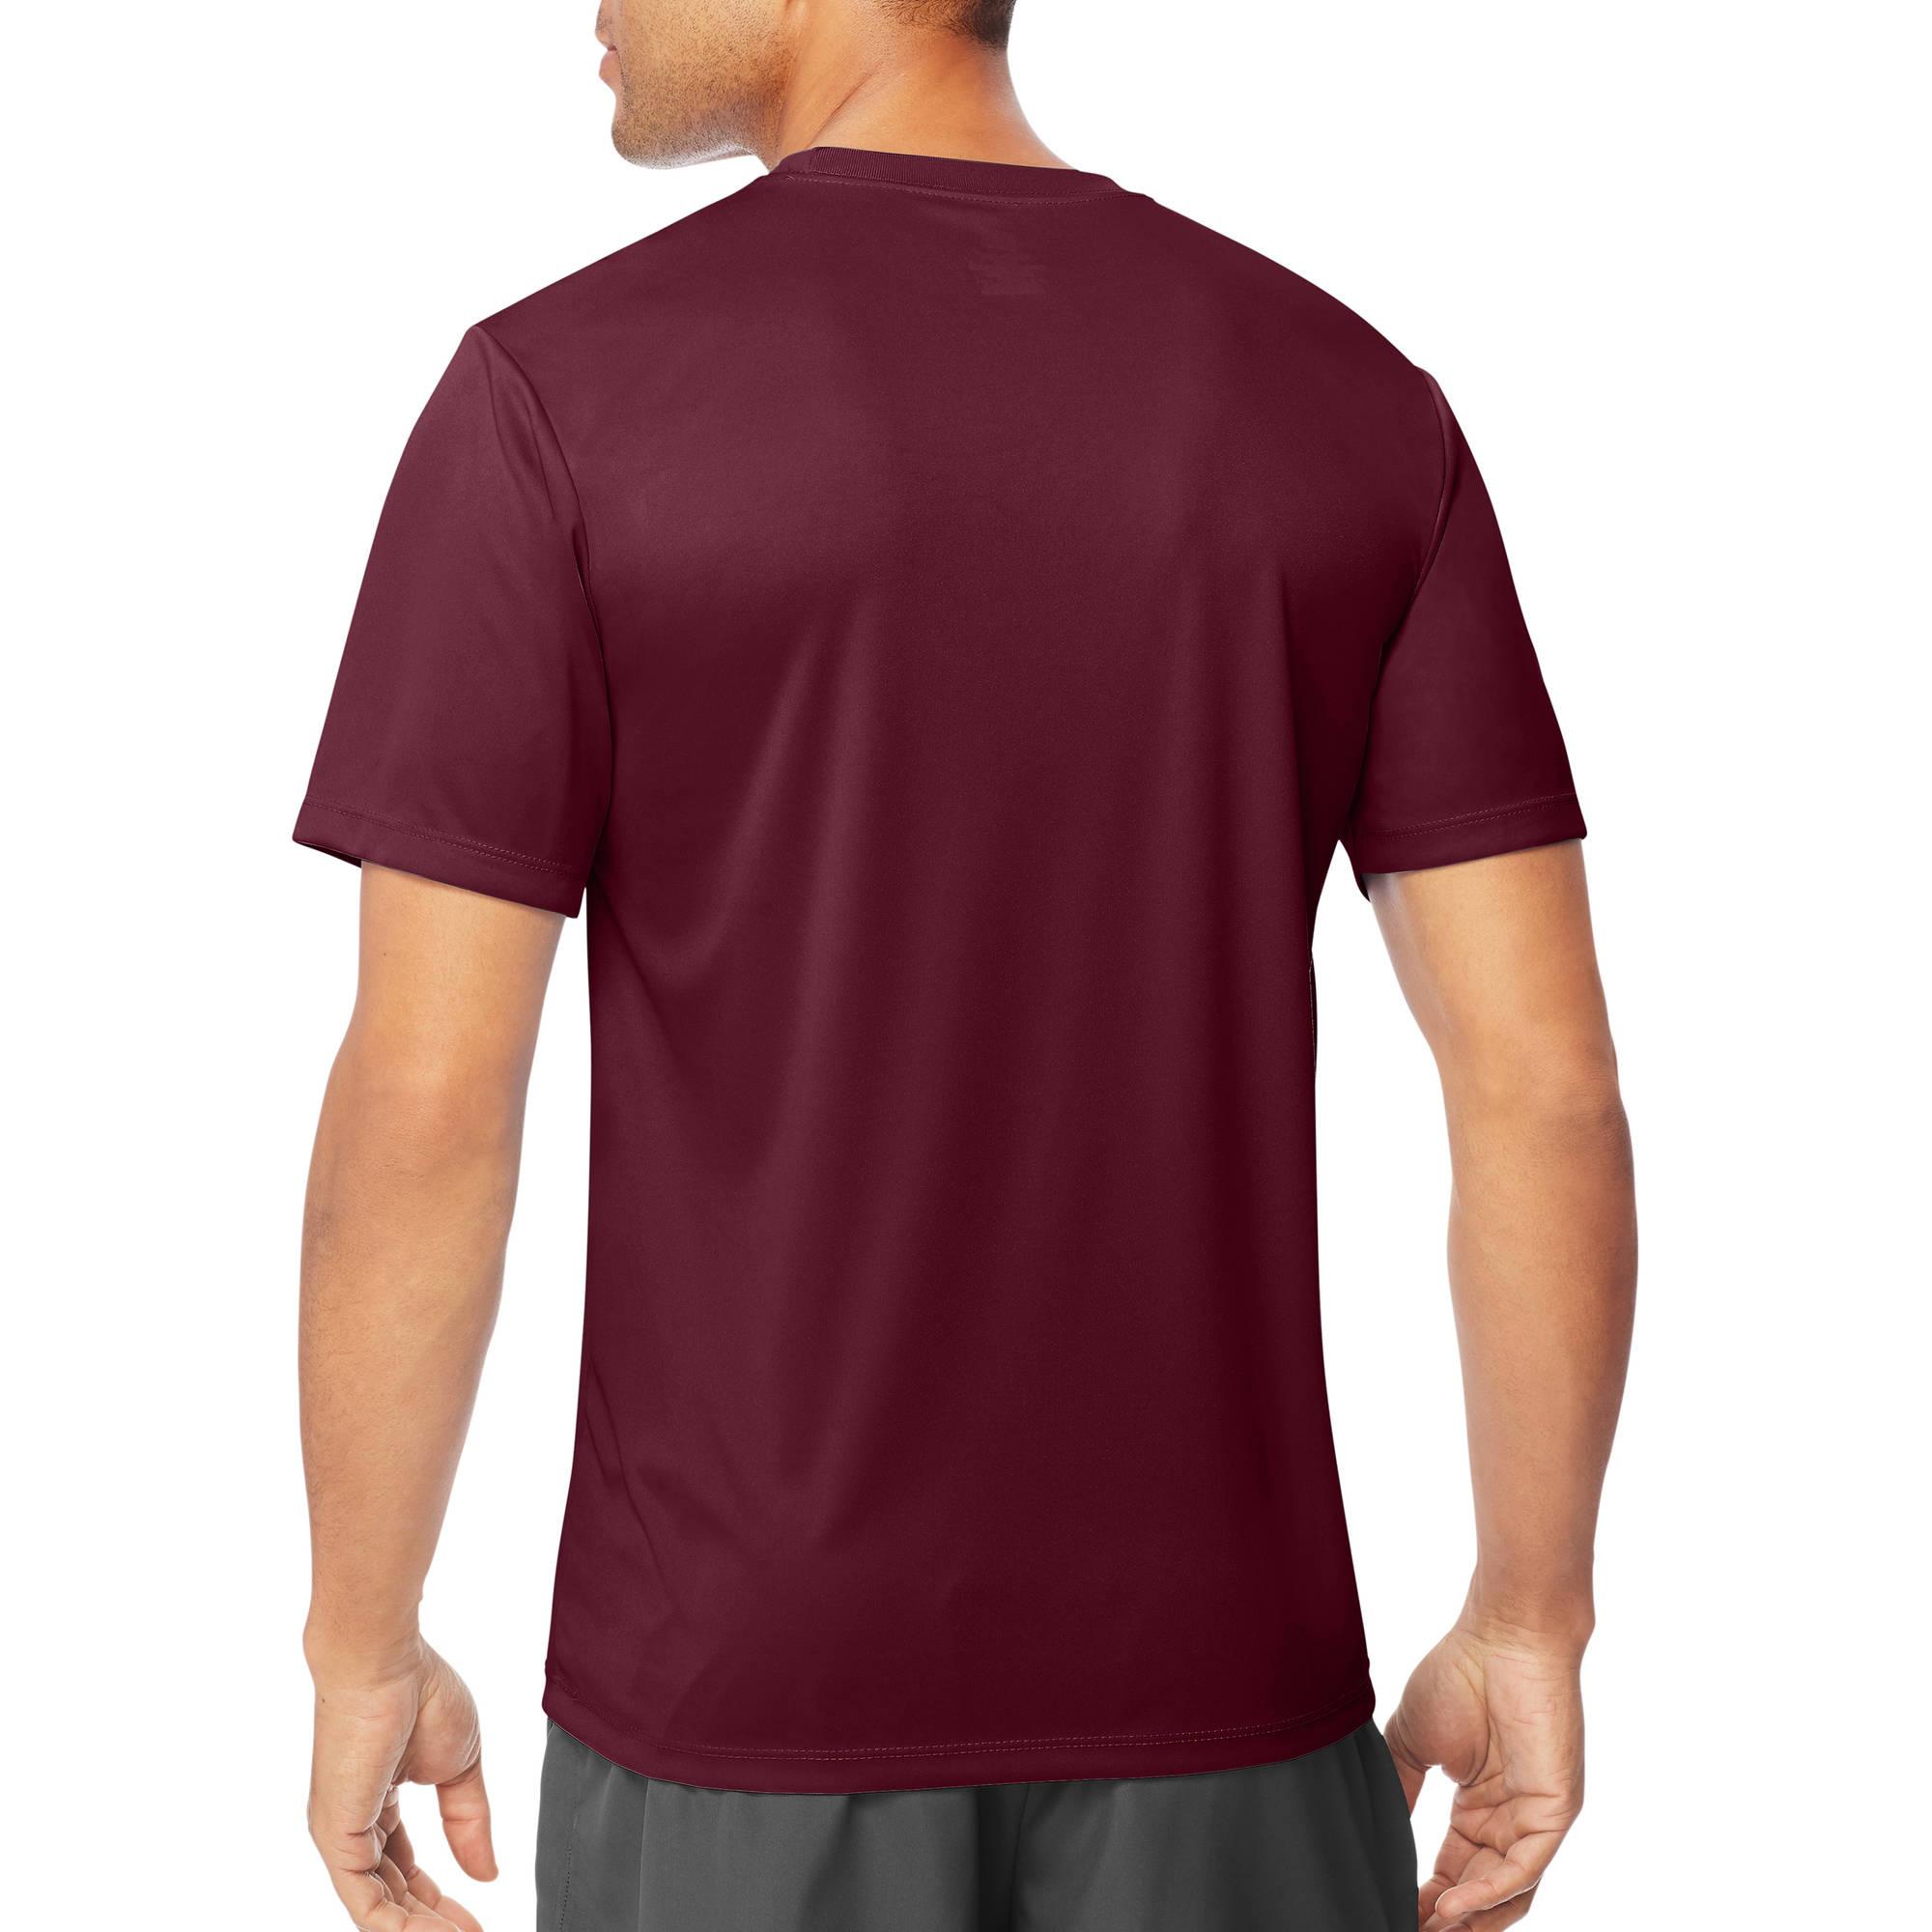 d72c03e3919 Sport Men s Short Sleeve CoolDri Performance Tee (50+ UPF) - Walmart.com